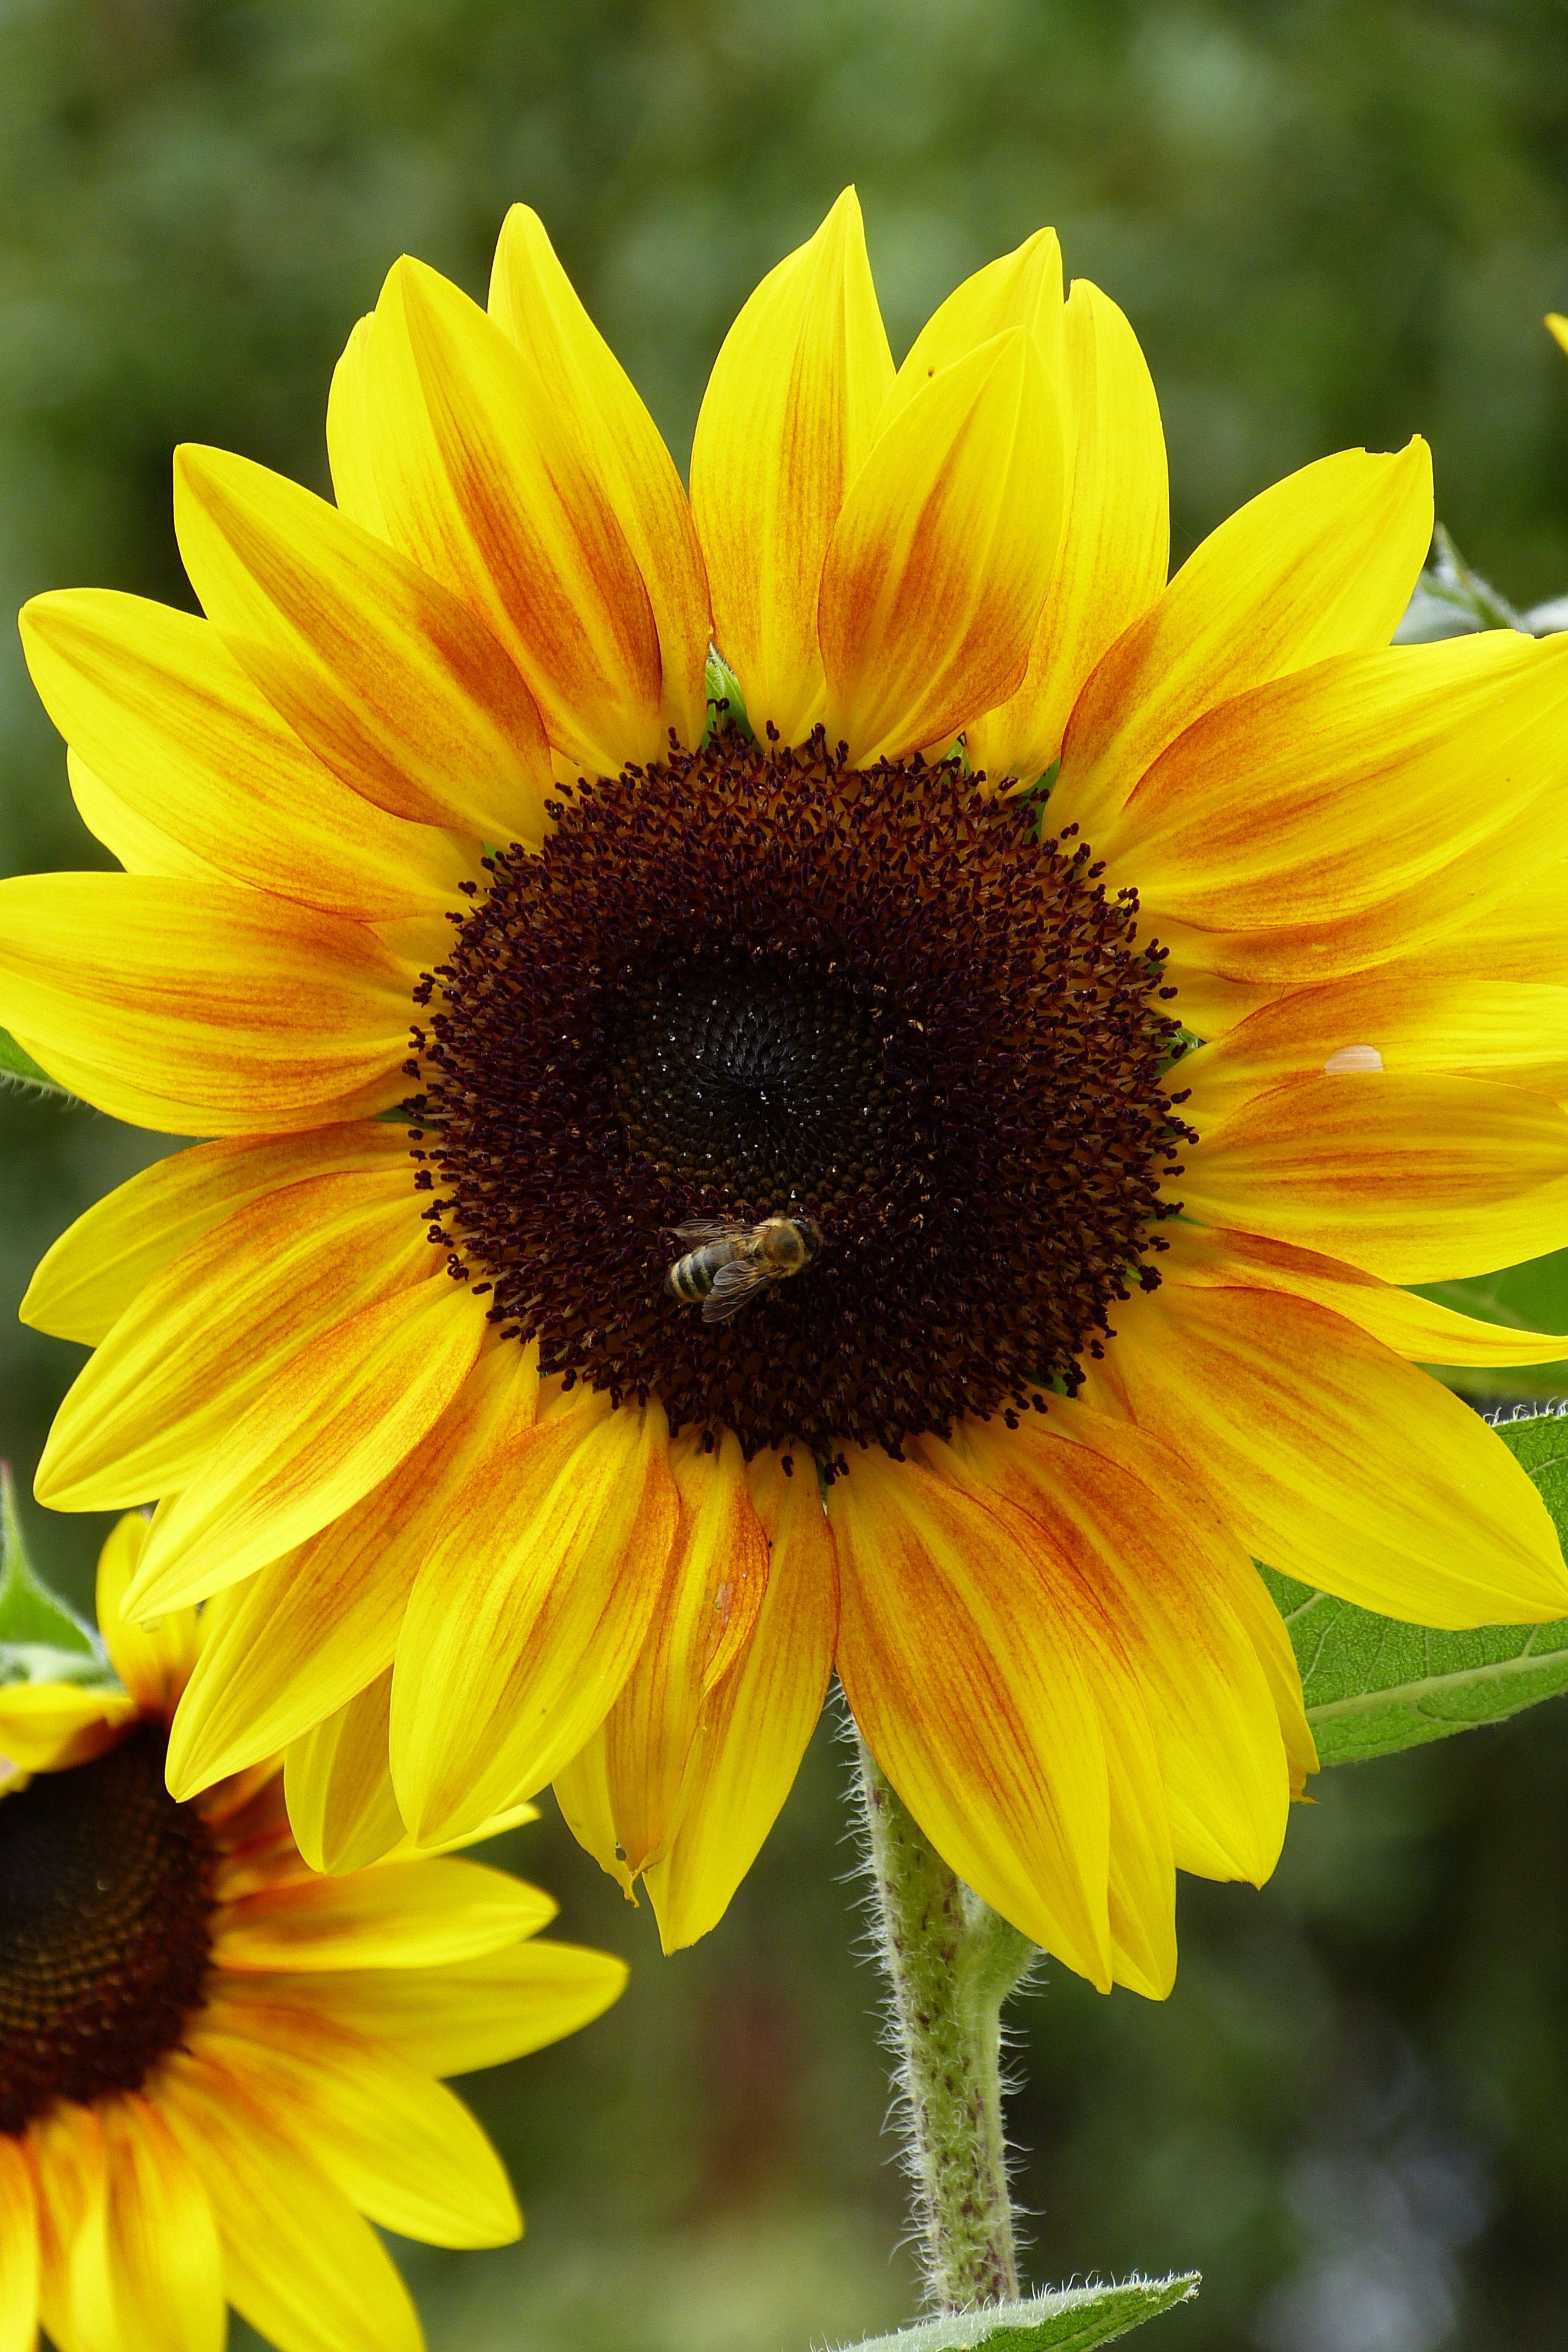 sunflowers Sunflowers and Daisies